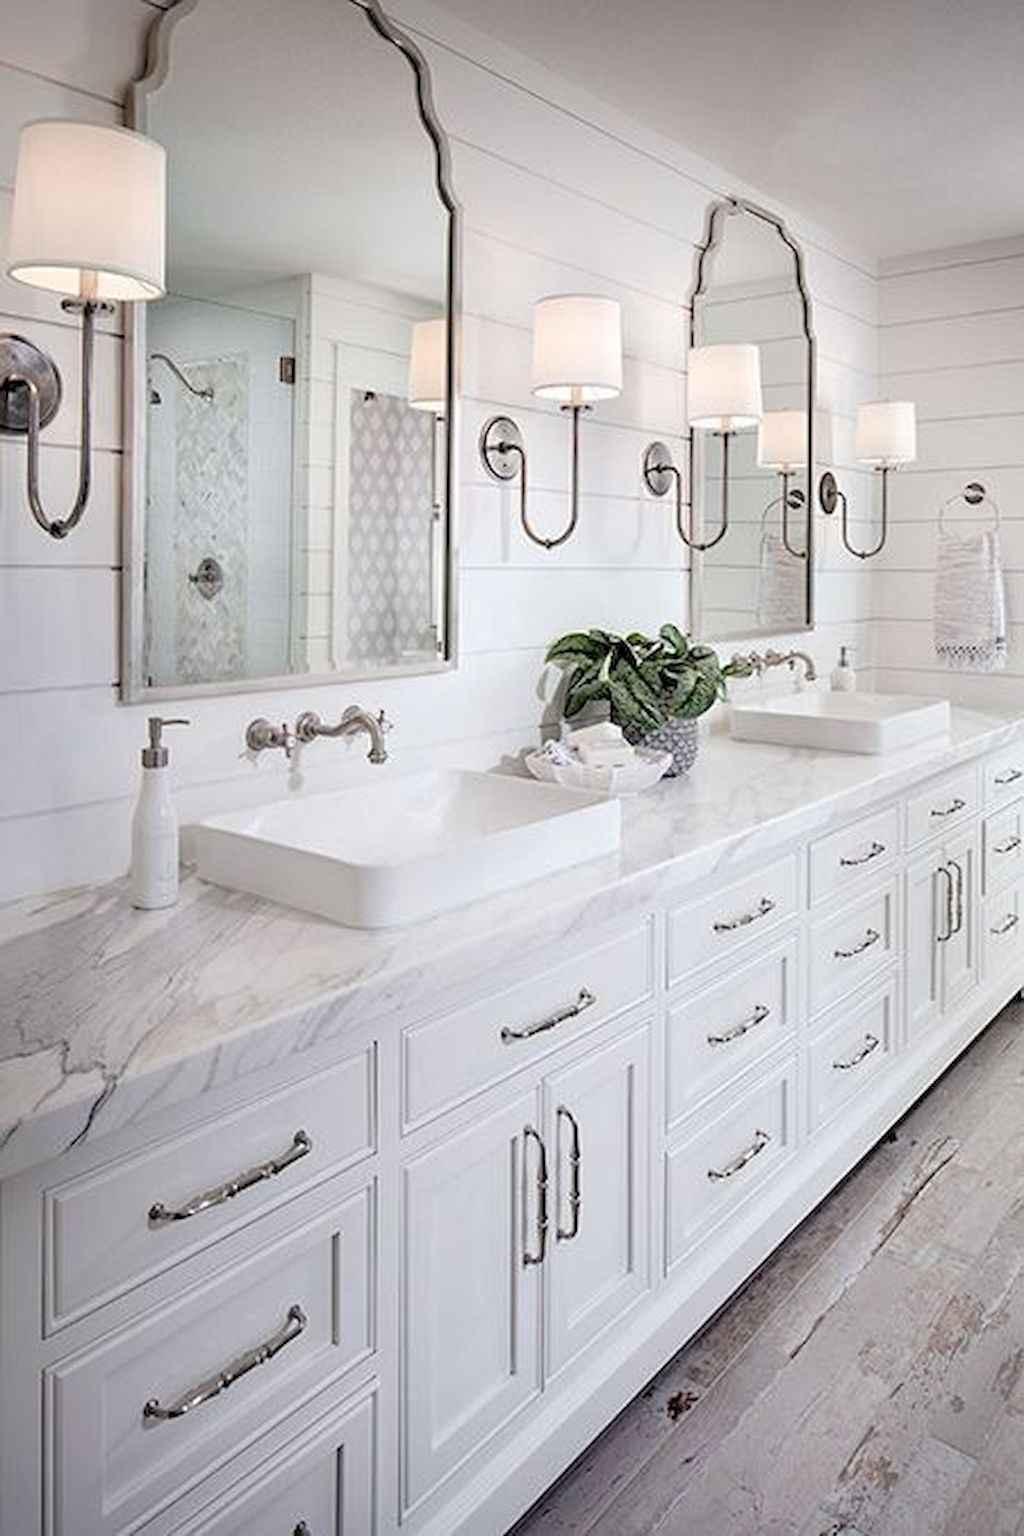 125 awesome farmhouse bathroom vanity remodel ideas (75)